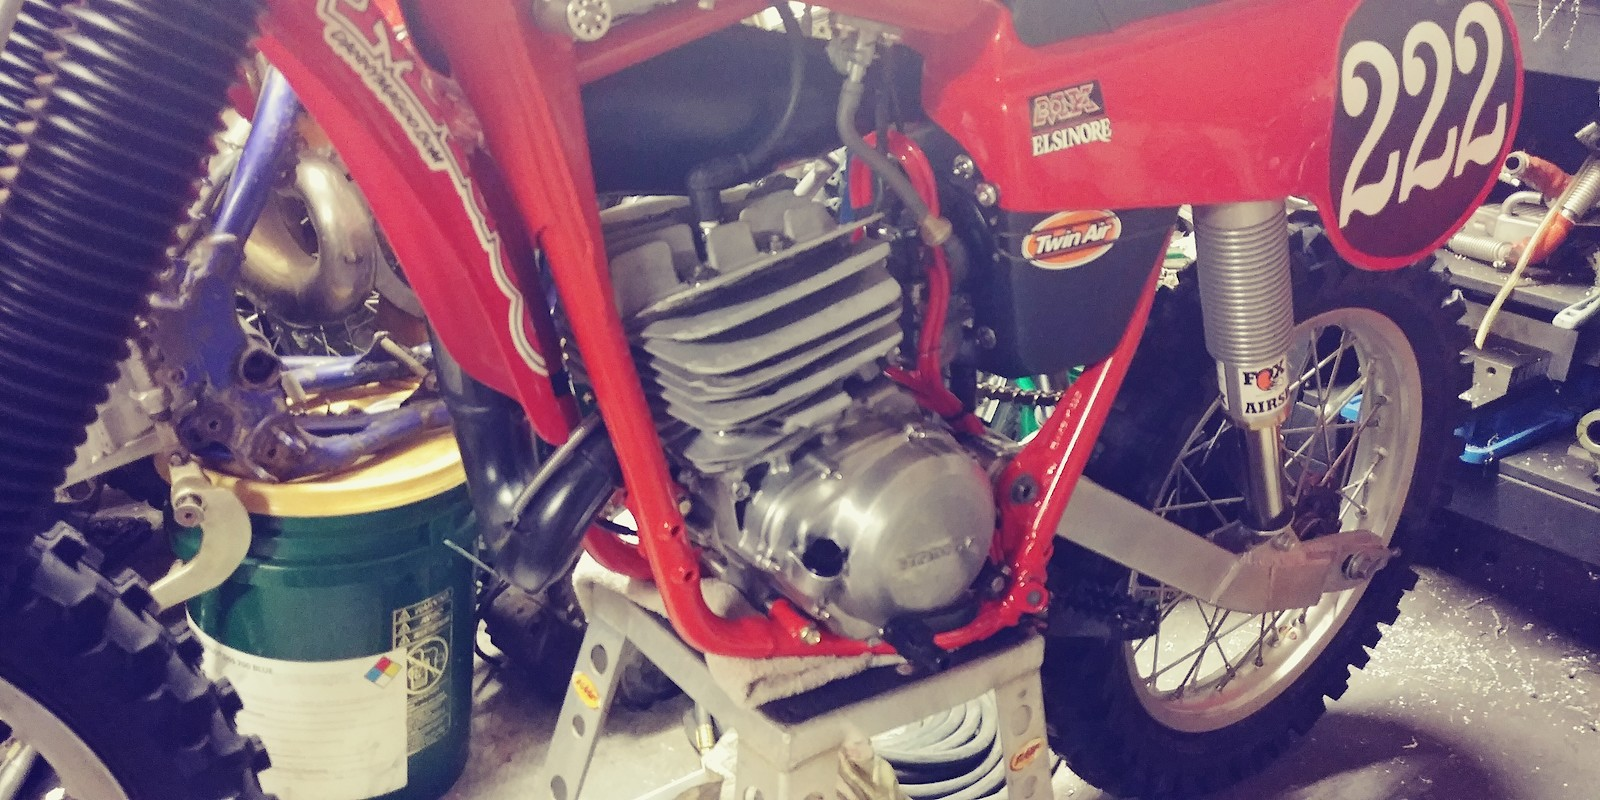 E.C. Birt Cylinder - mxbonz - Motocross Pictures - Vital MX